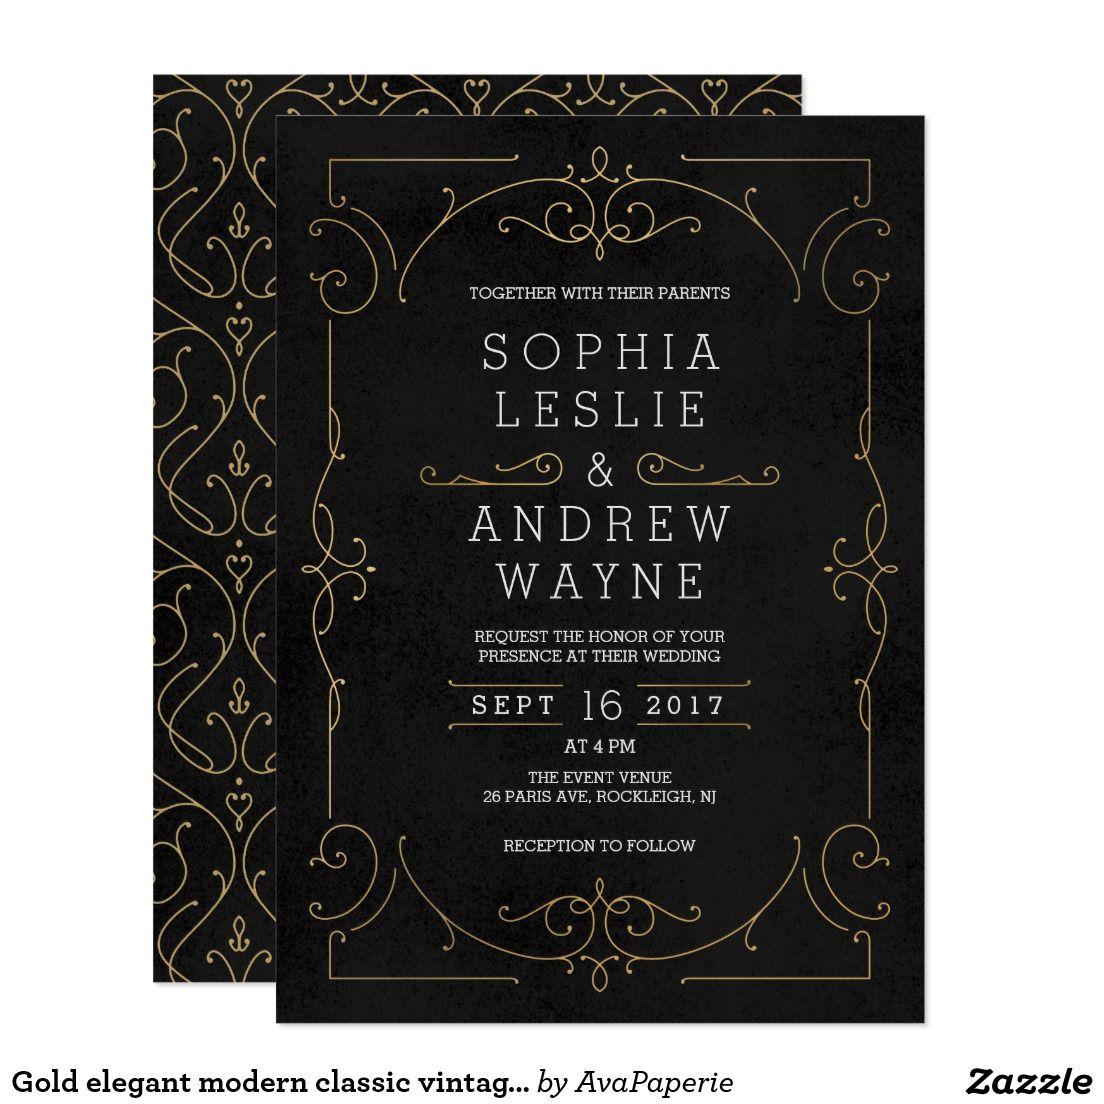 Gold elegant modern classic vintage wedding card | Modern classic ...